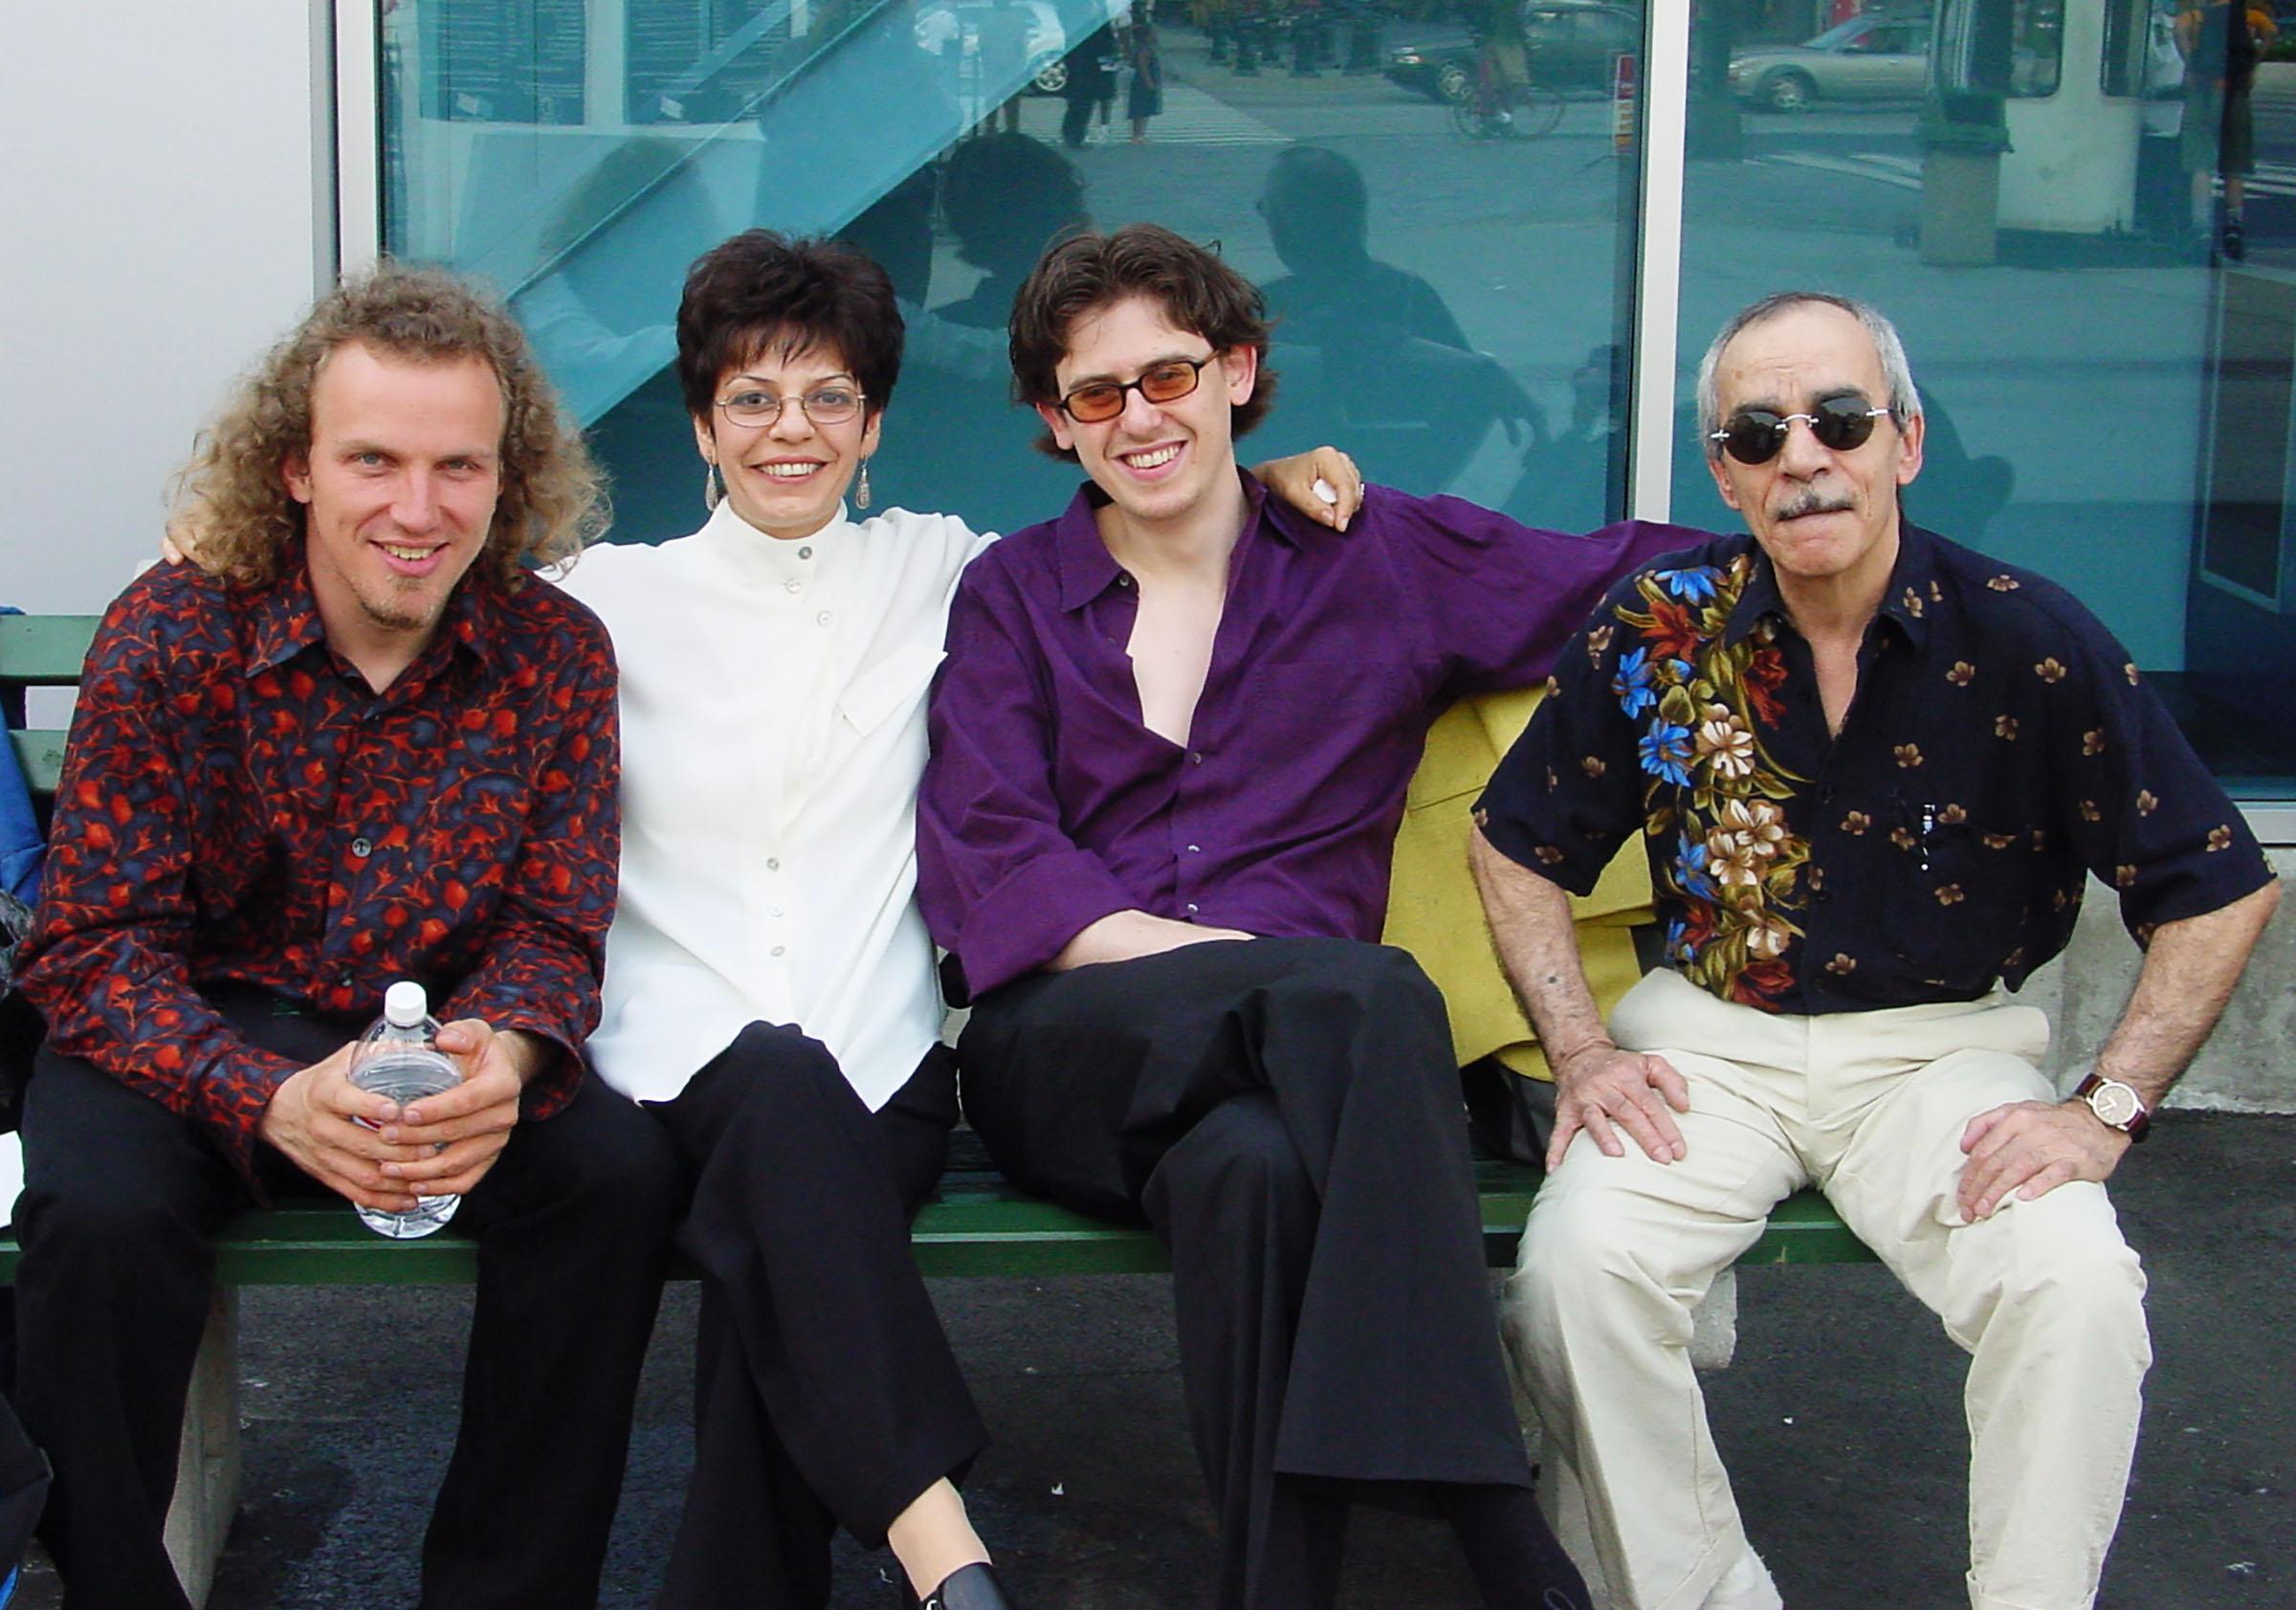 Datevik with bassist,Hans Glawischnig,drummer, Portinho, and pianist, Misha Piatigorsky.